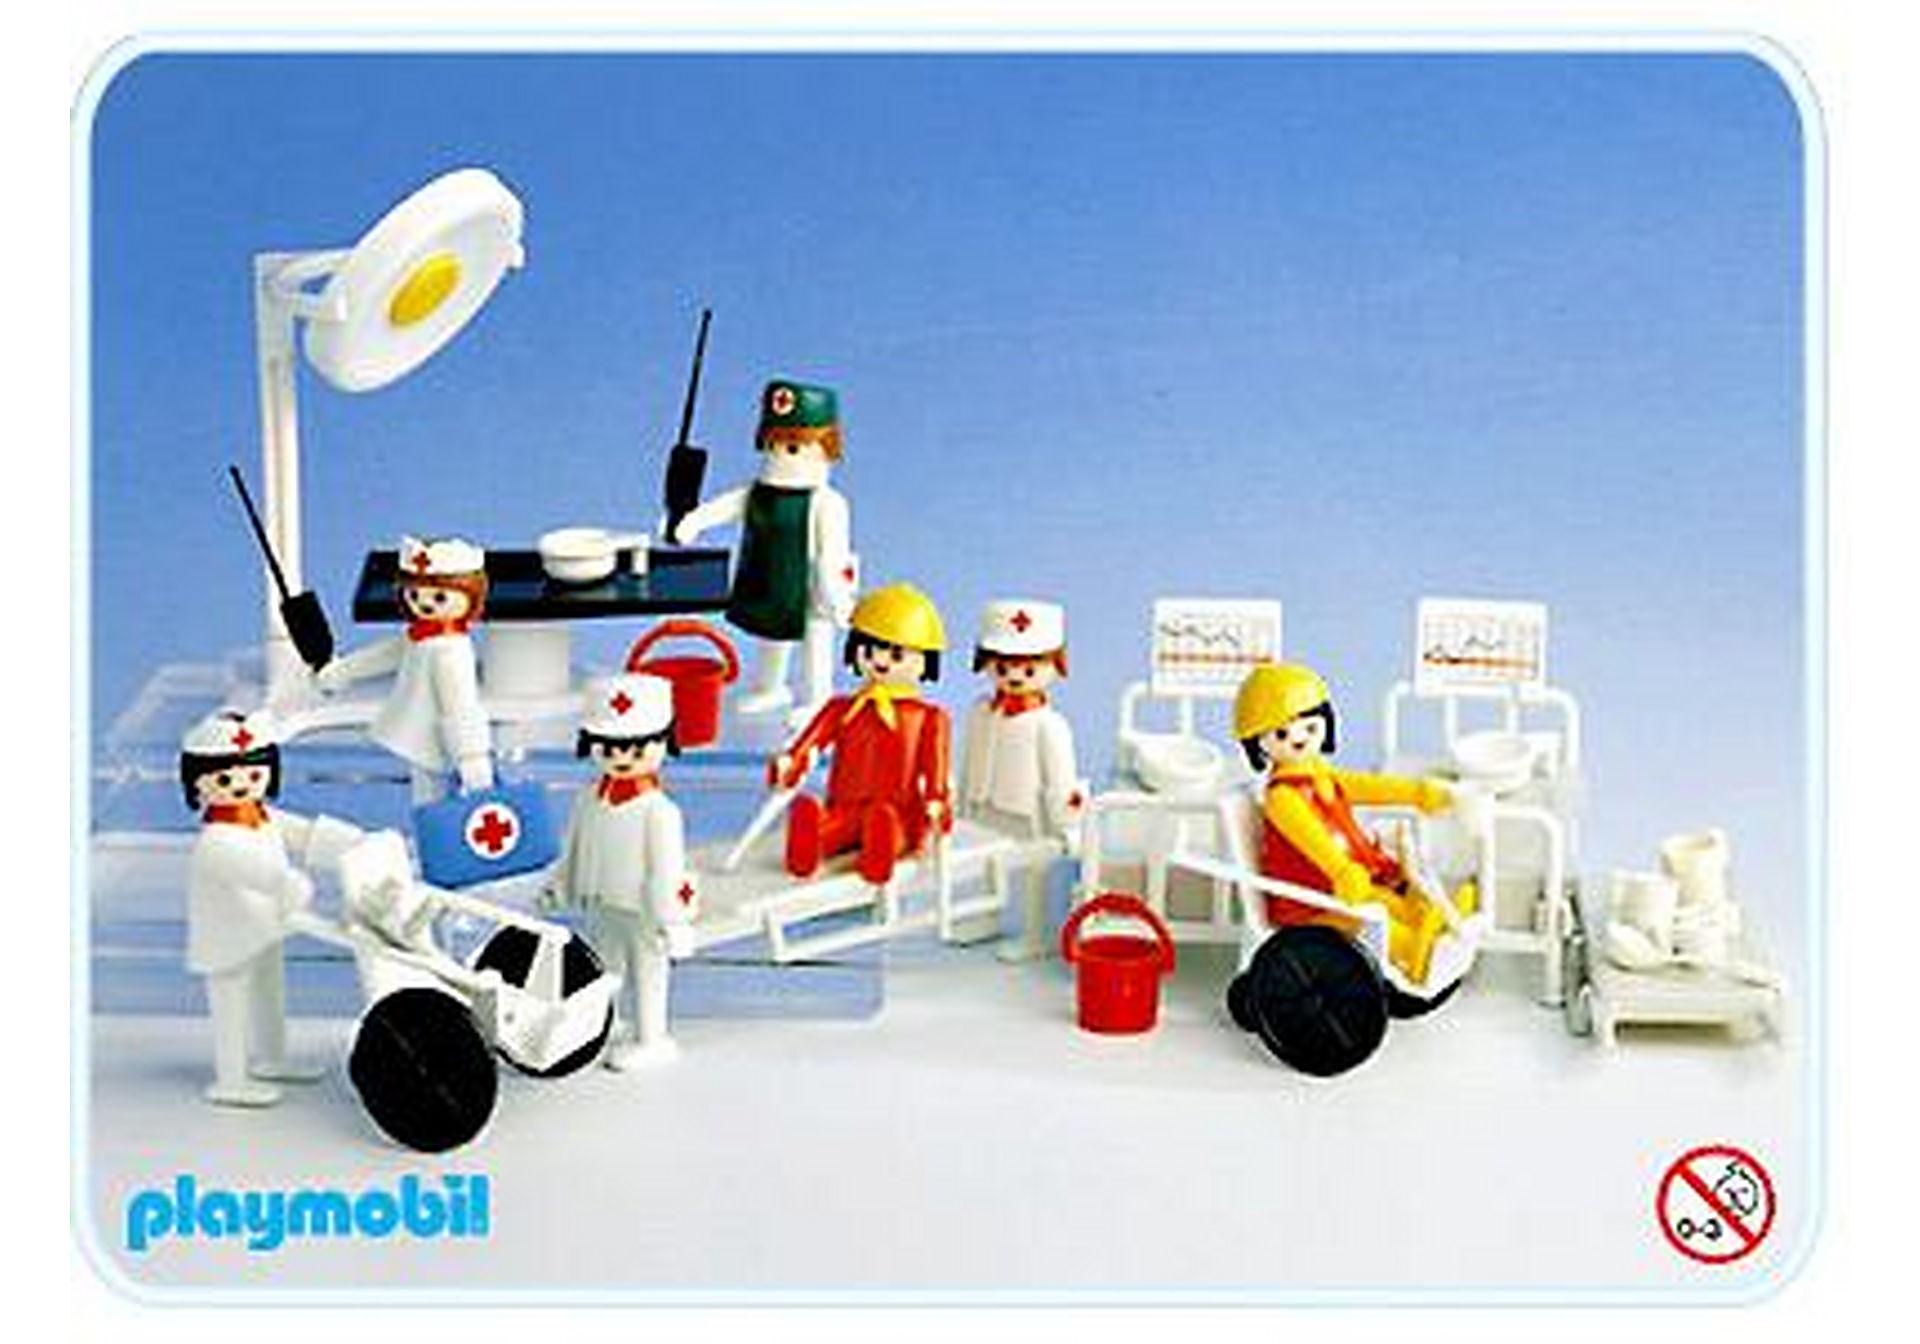 http://media.playmobil.com/i/playmobil/3404-A_product_detail/Super Set Infirmerie